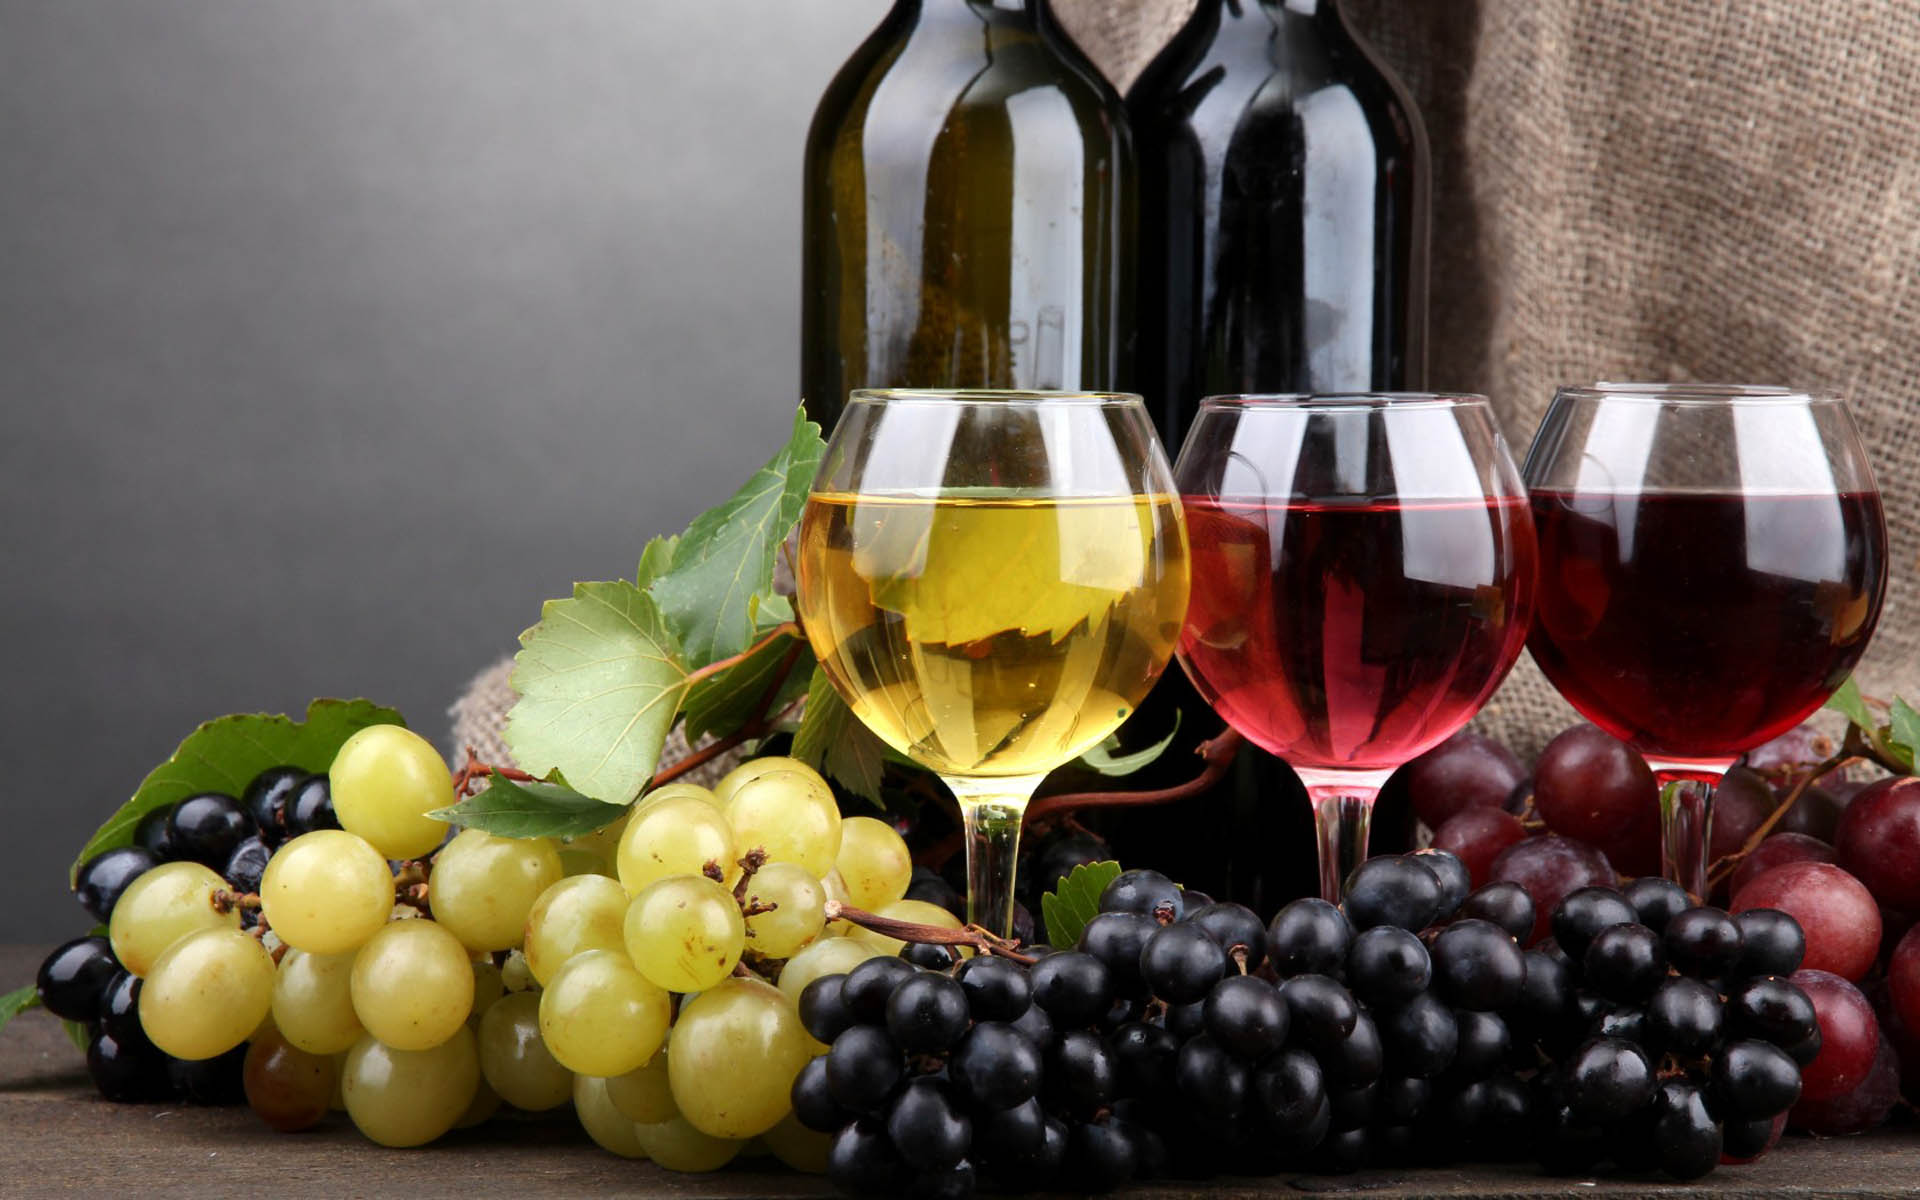 headache home remedies migraine wine trigger